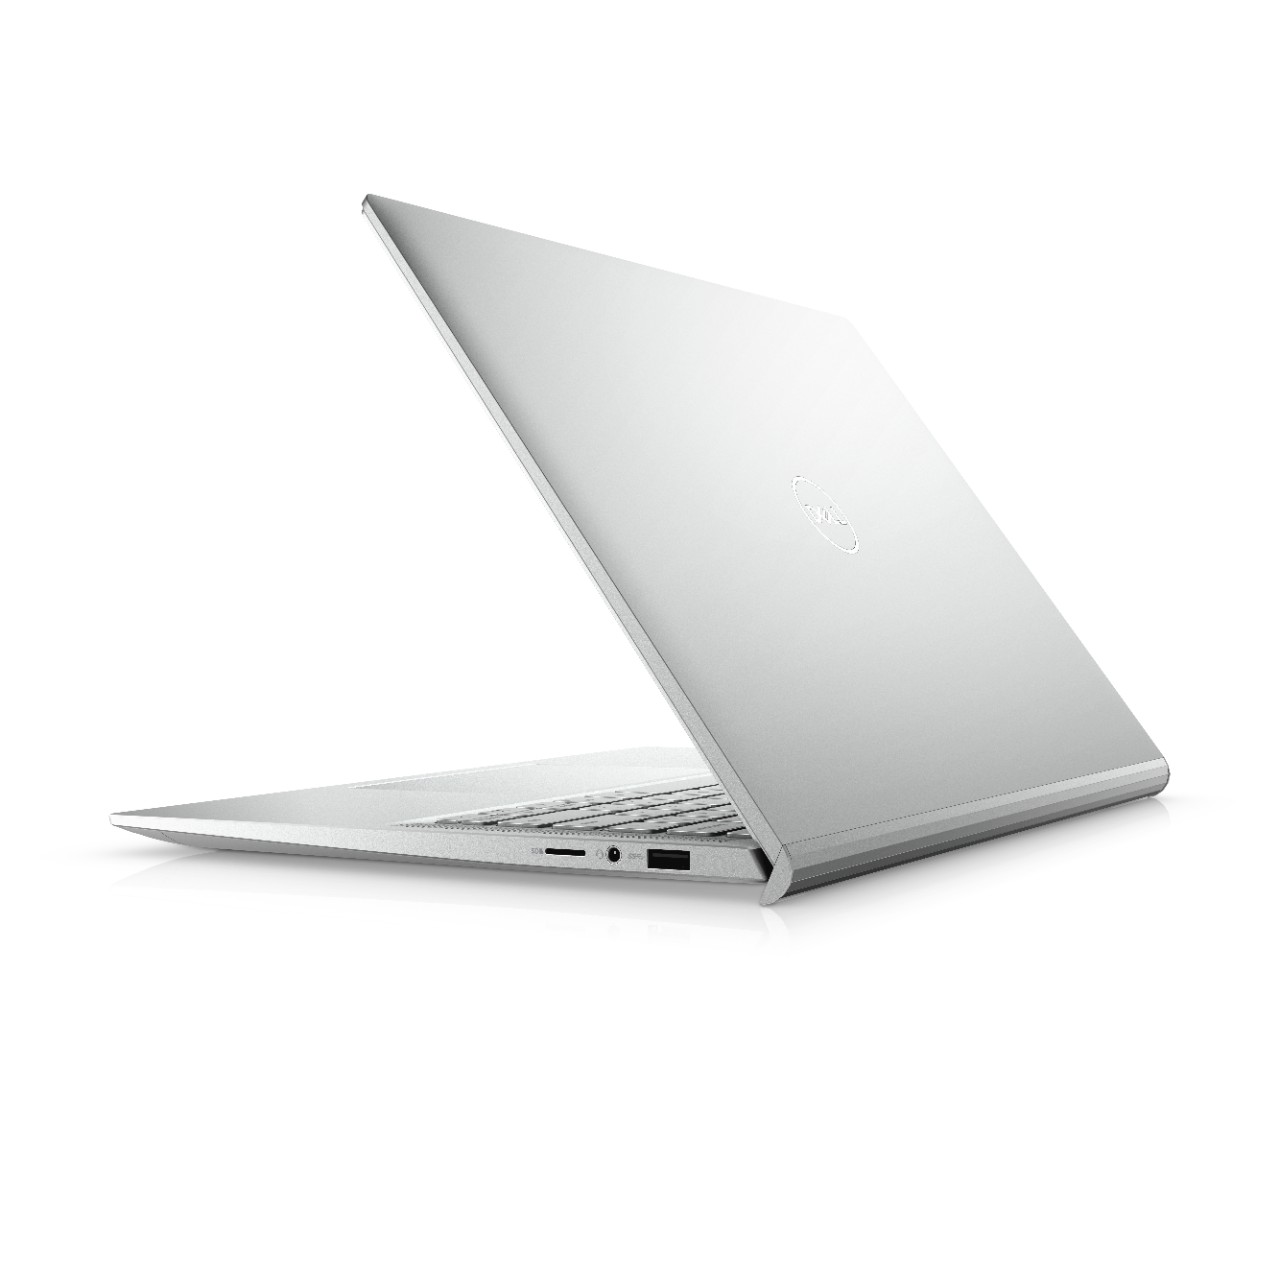 "Dell Inspiron 7400 14,5"" QHD+ i7-1165G7/8GB/512GB-SSD/FPR/MCR/HDMI/THB/W10H/2RNBD/Stříbrný; N-7400-N2-711S"